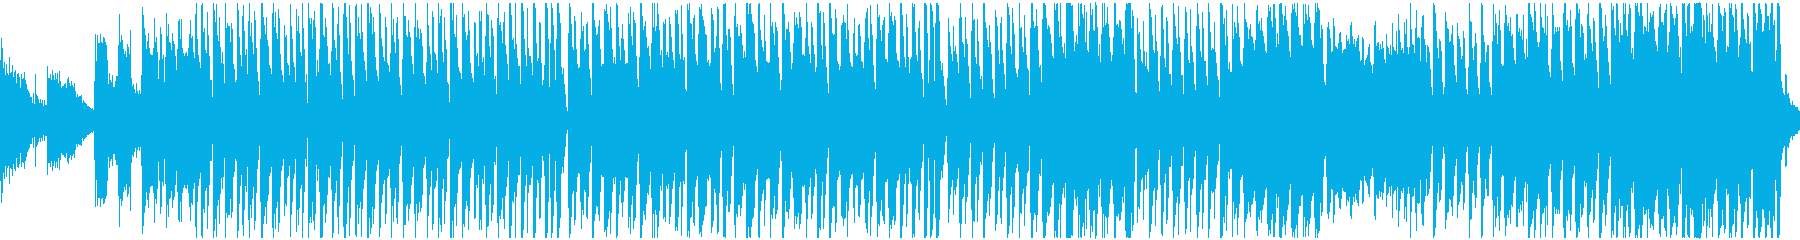 Pop Halloween song (loop)'s reproduced waveform